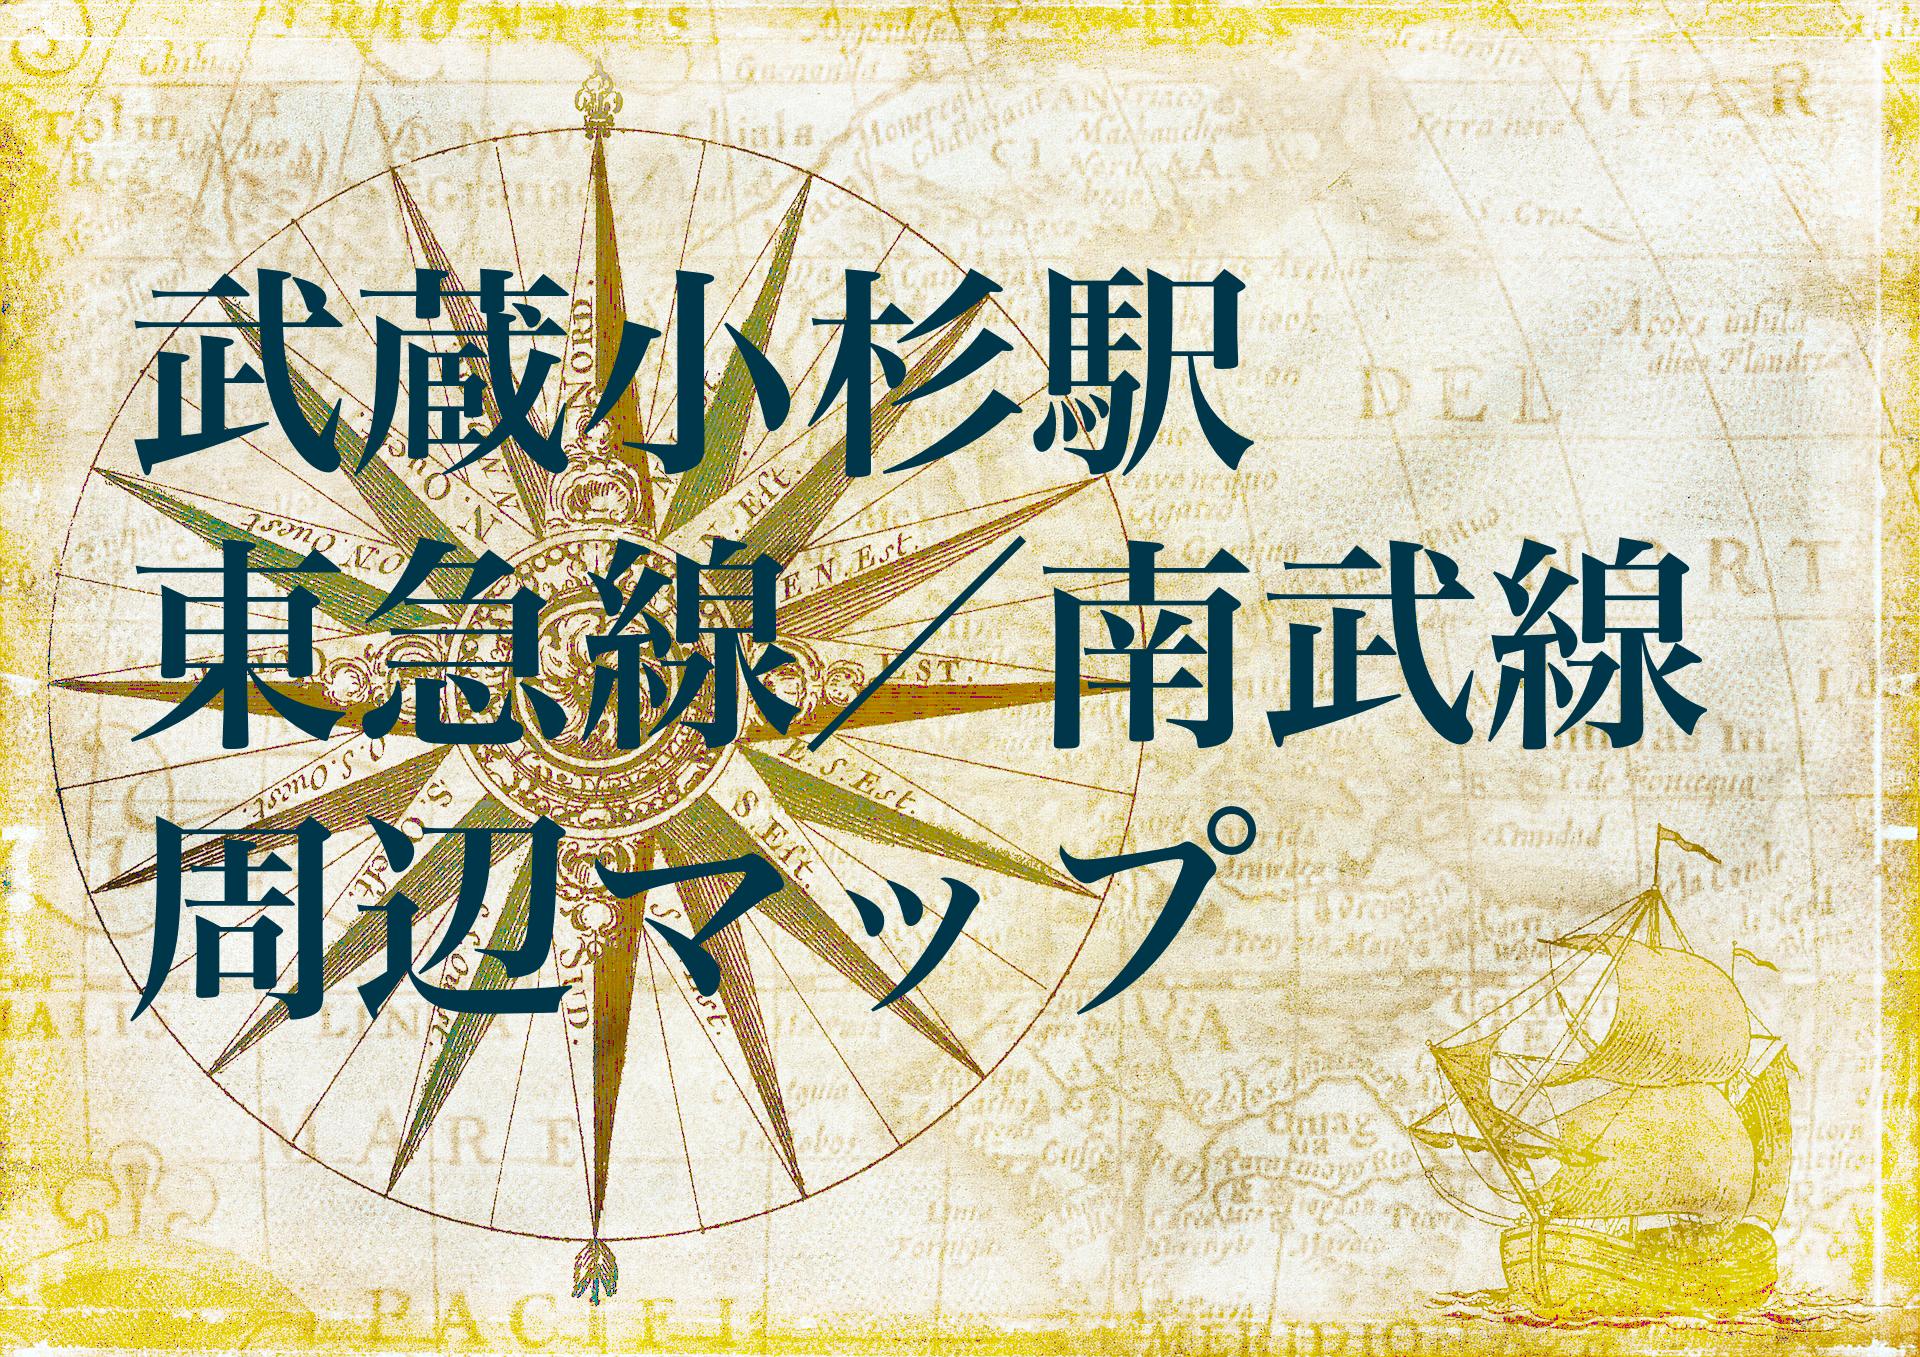 武蔵小杉駅(東急東横線/南武線)周辺マップ